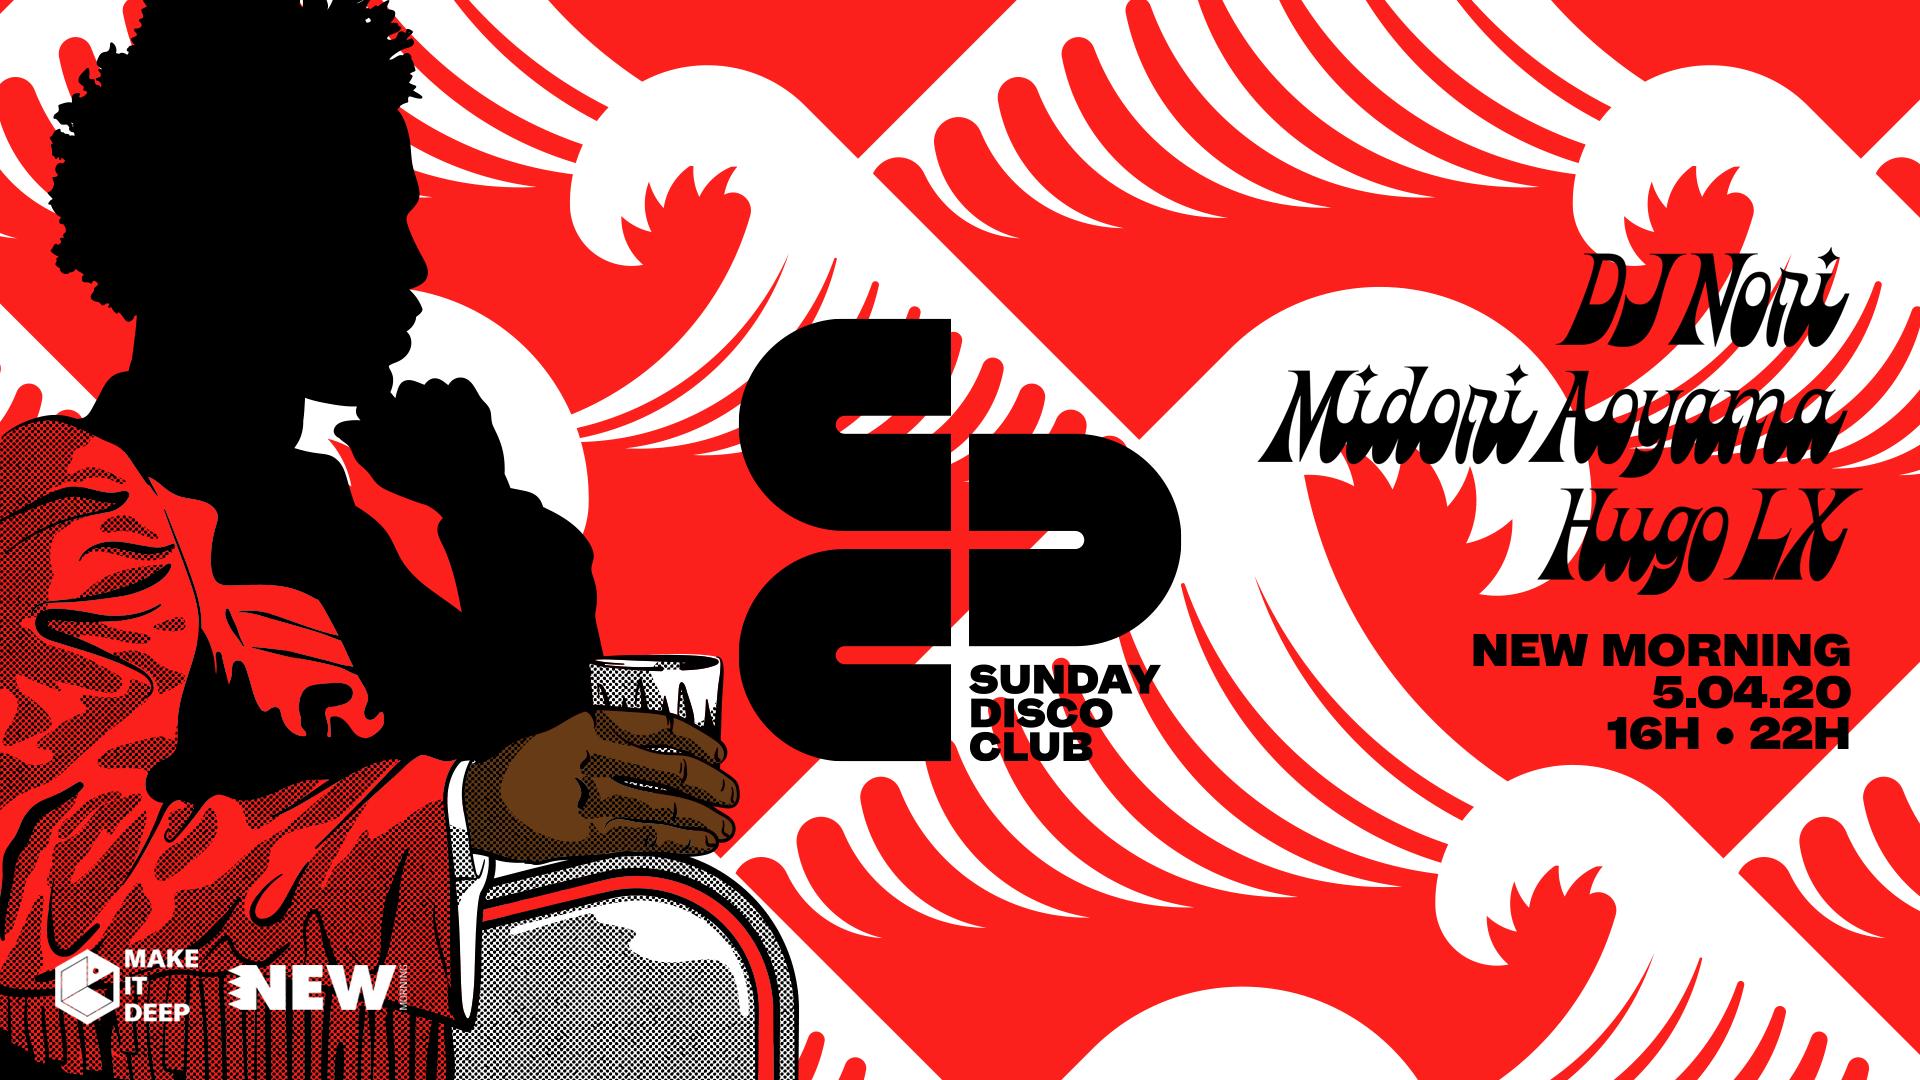 SUNDAY DISCO CLUB - DJ Nori, Hugo LX, Midori Aoyama